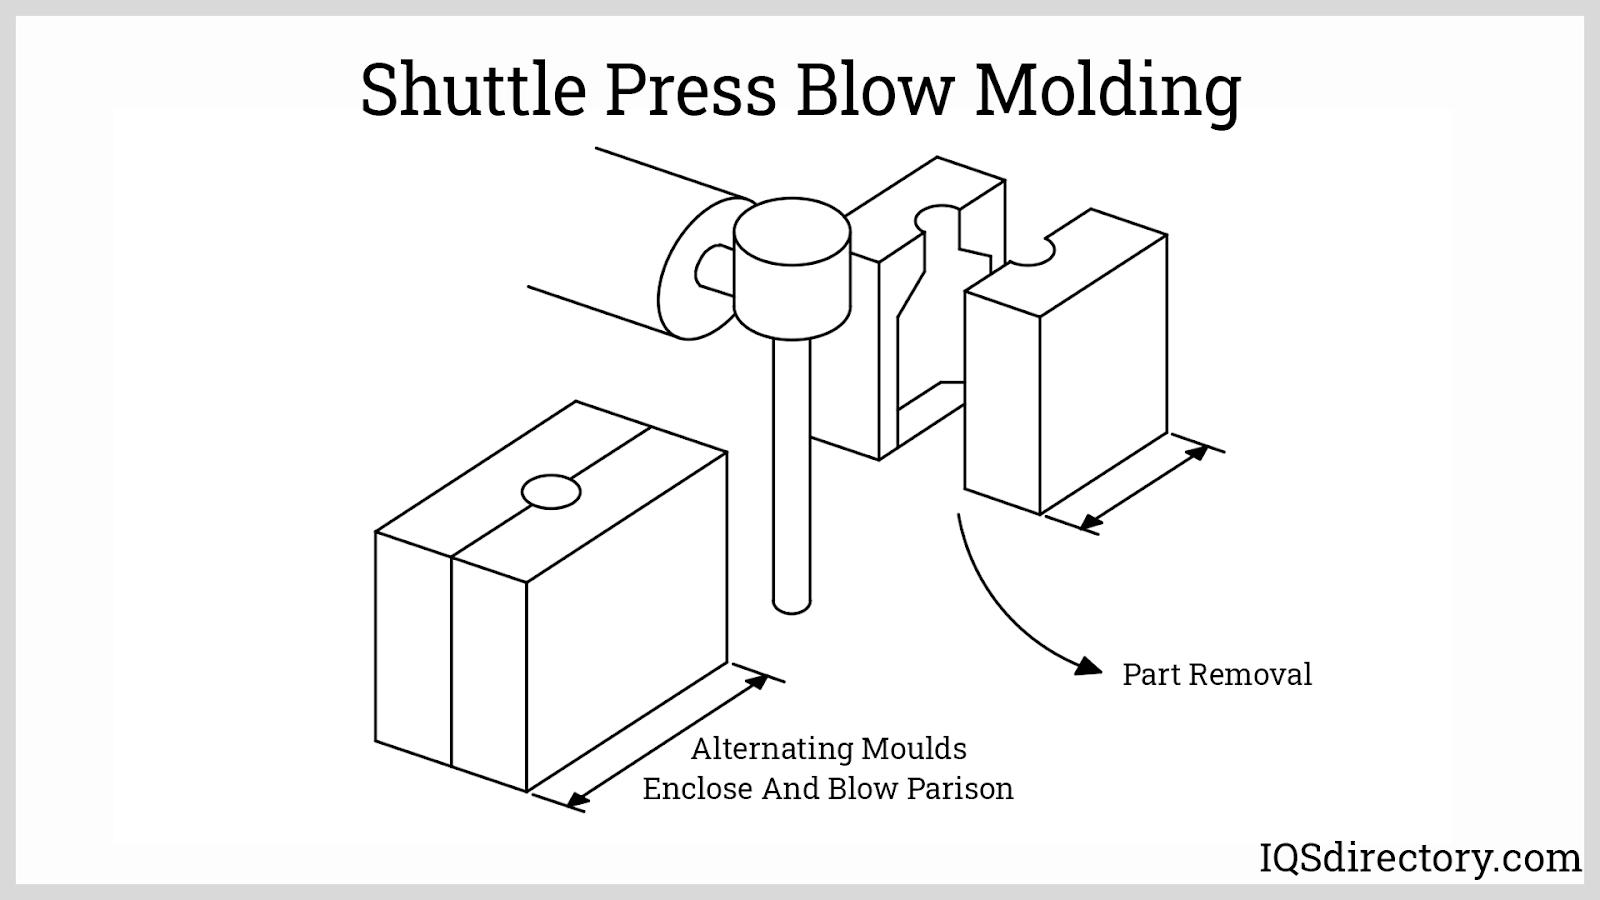 Shuttle Press Blow Molding